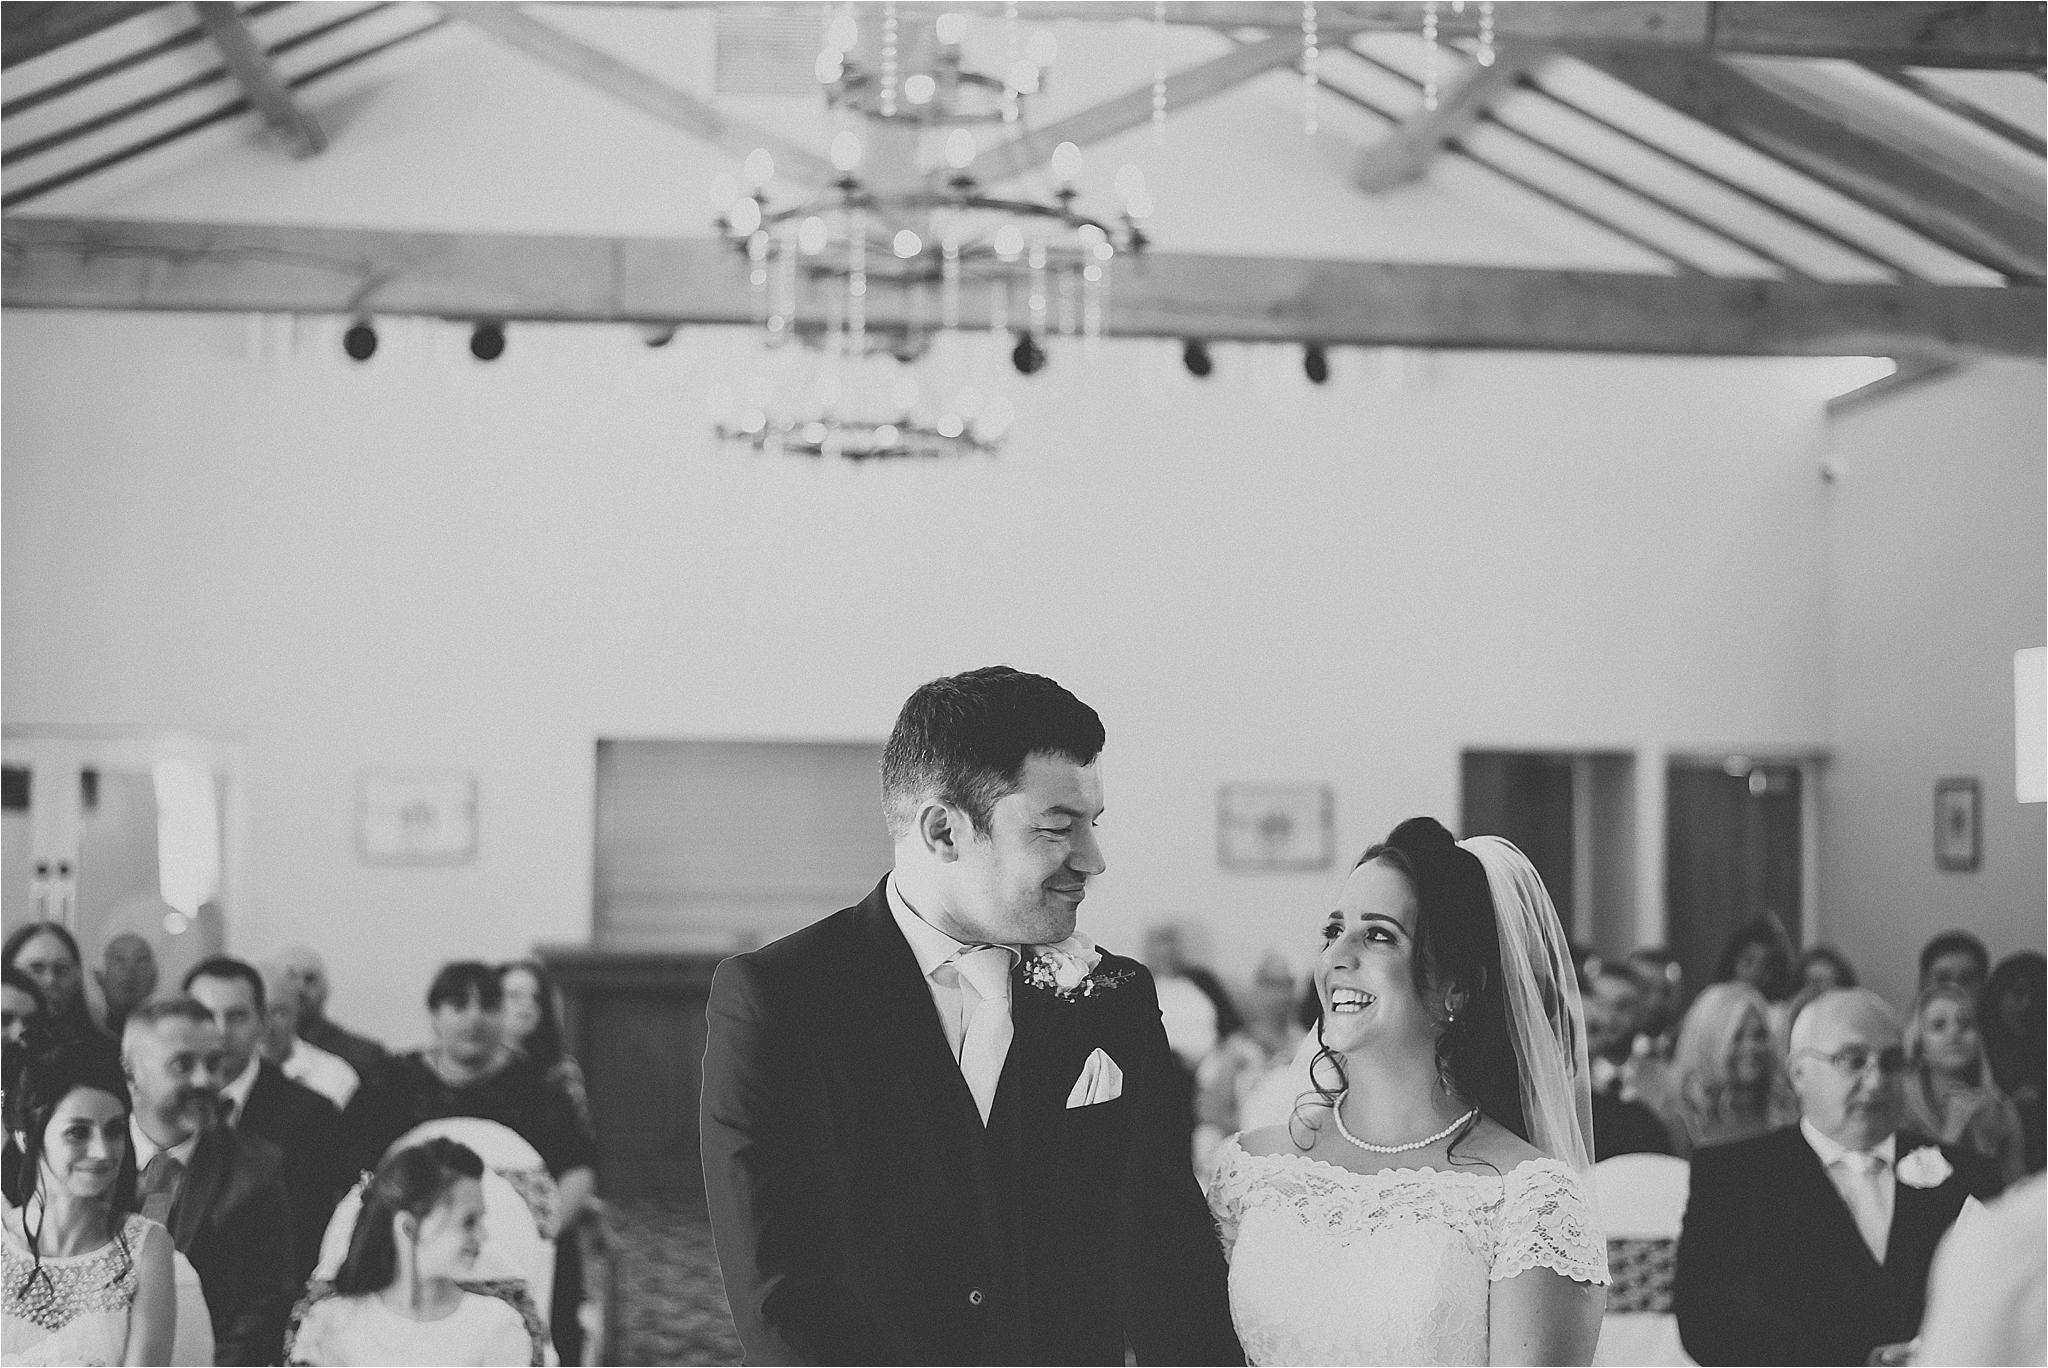 thevilla+lancashire+wreagreen+wedding+photographer26.jpg